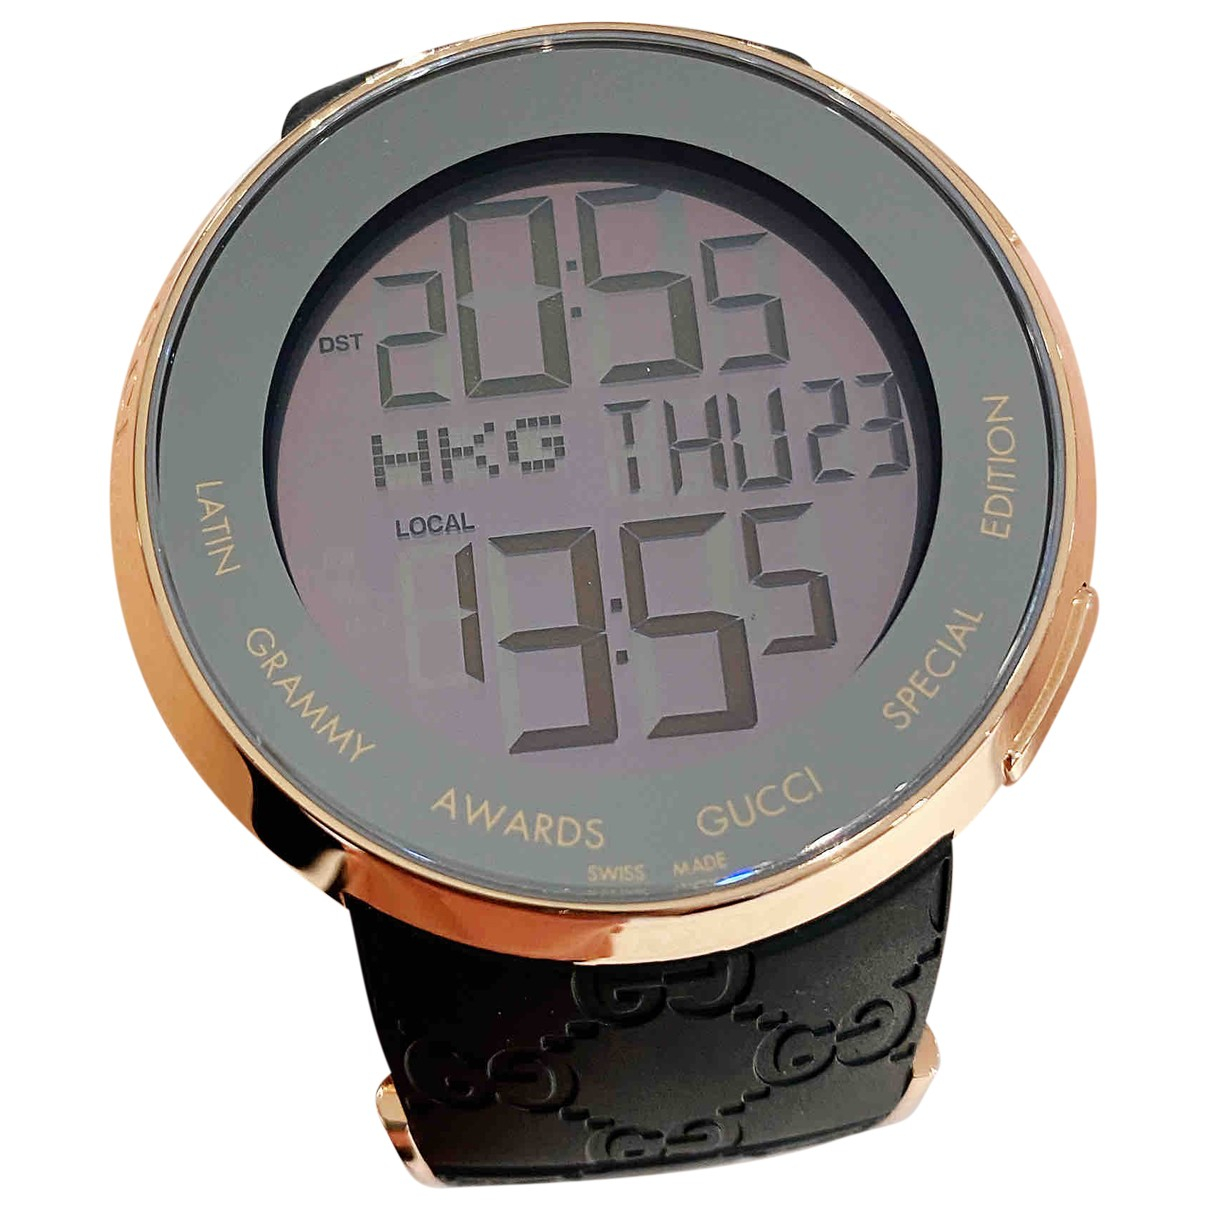 Gucci I-Gucci Digital Uhr in  Gold Stahl